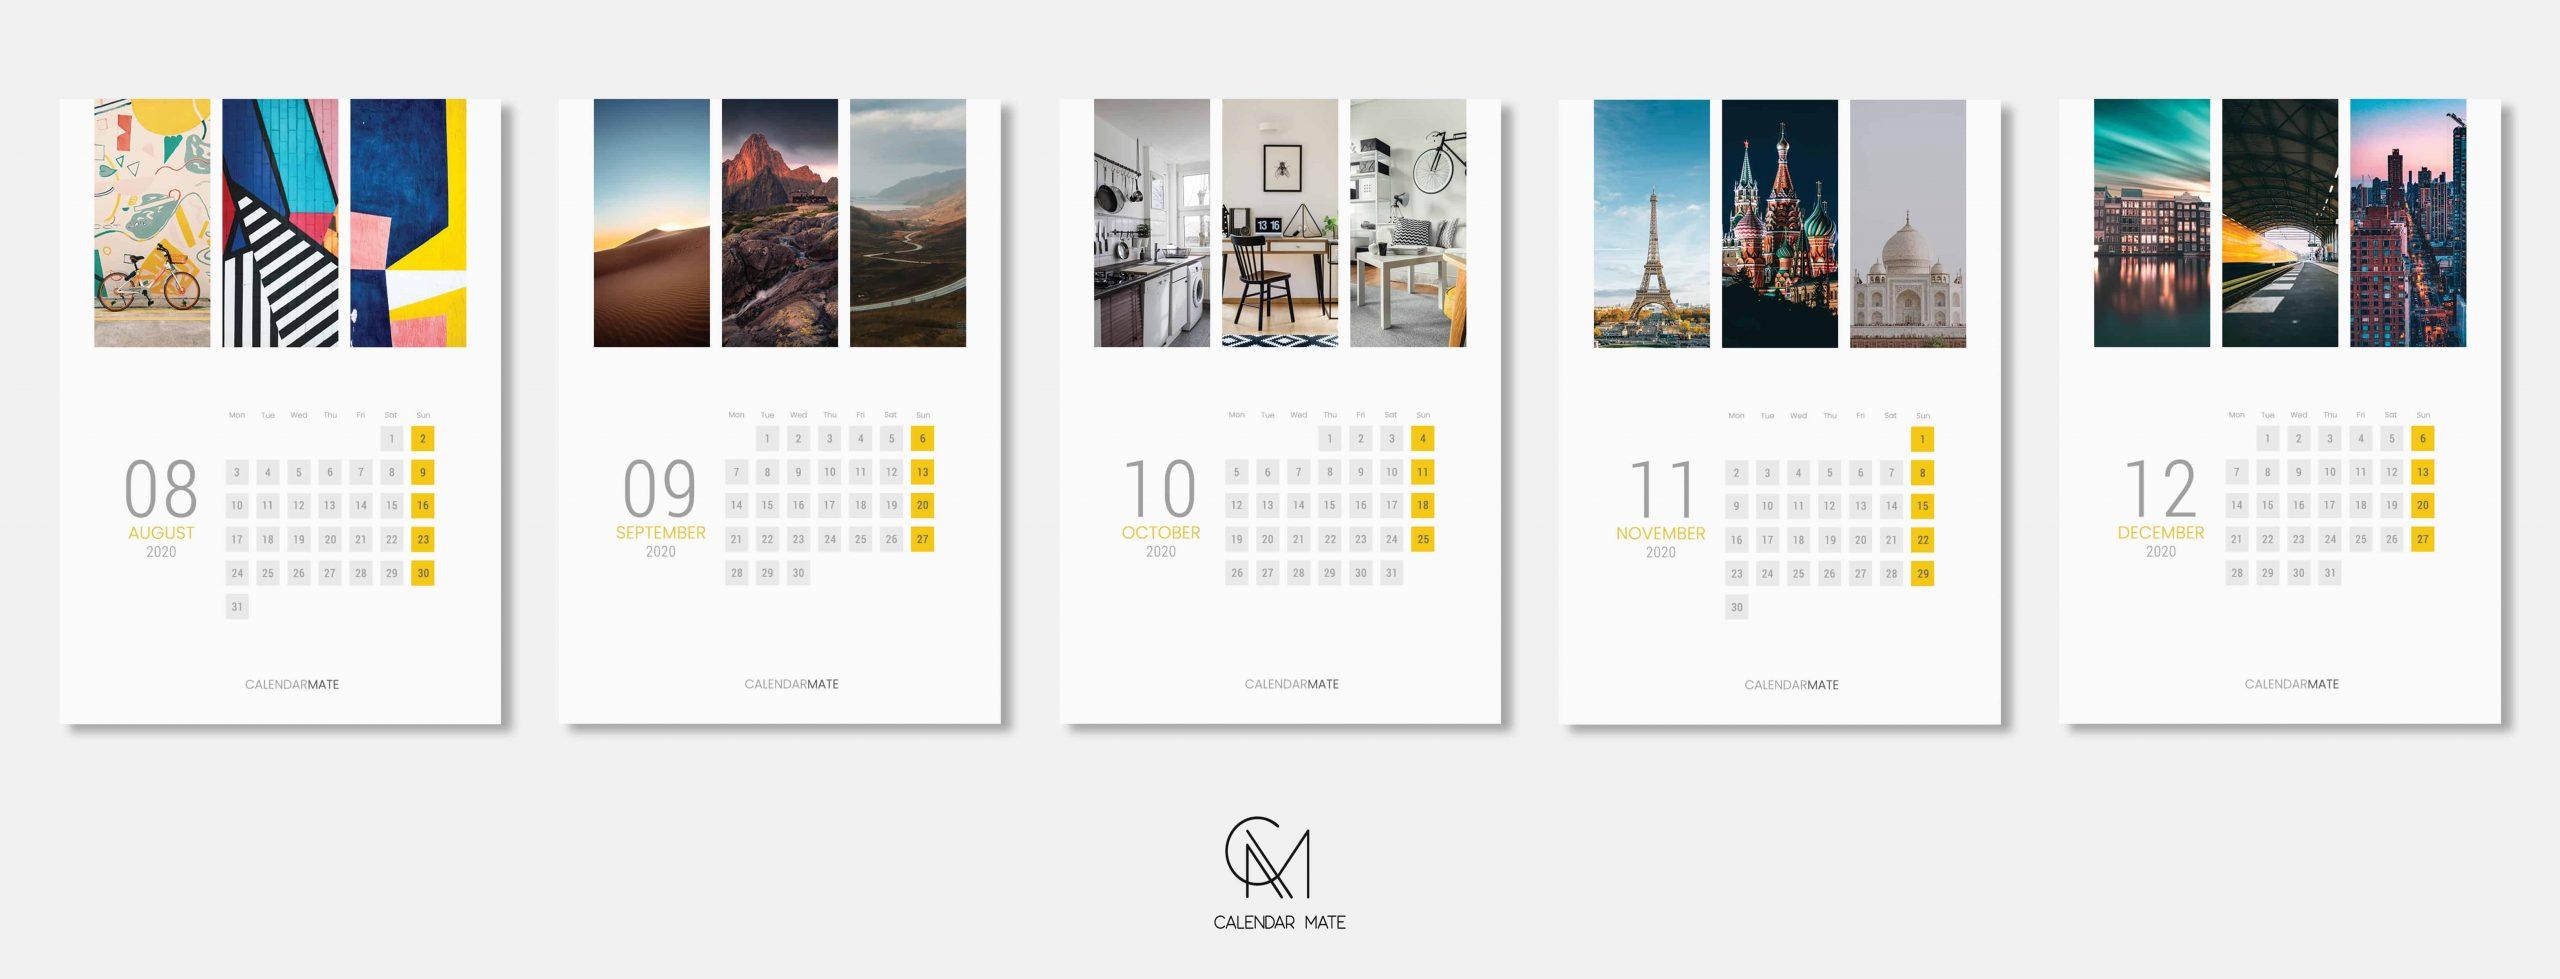 Railey: Simple Minimal Wall Calendar Design 2020 Template